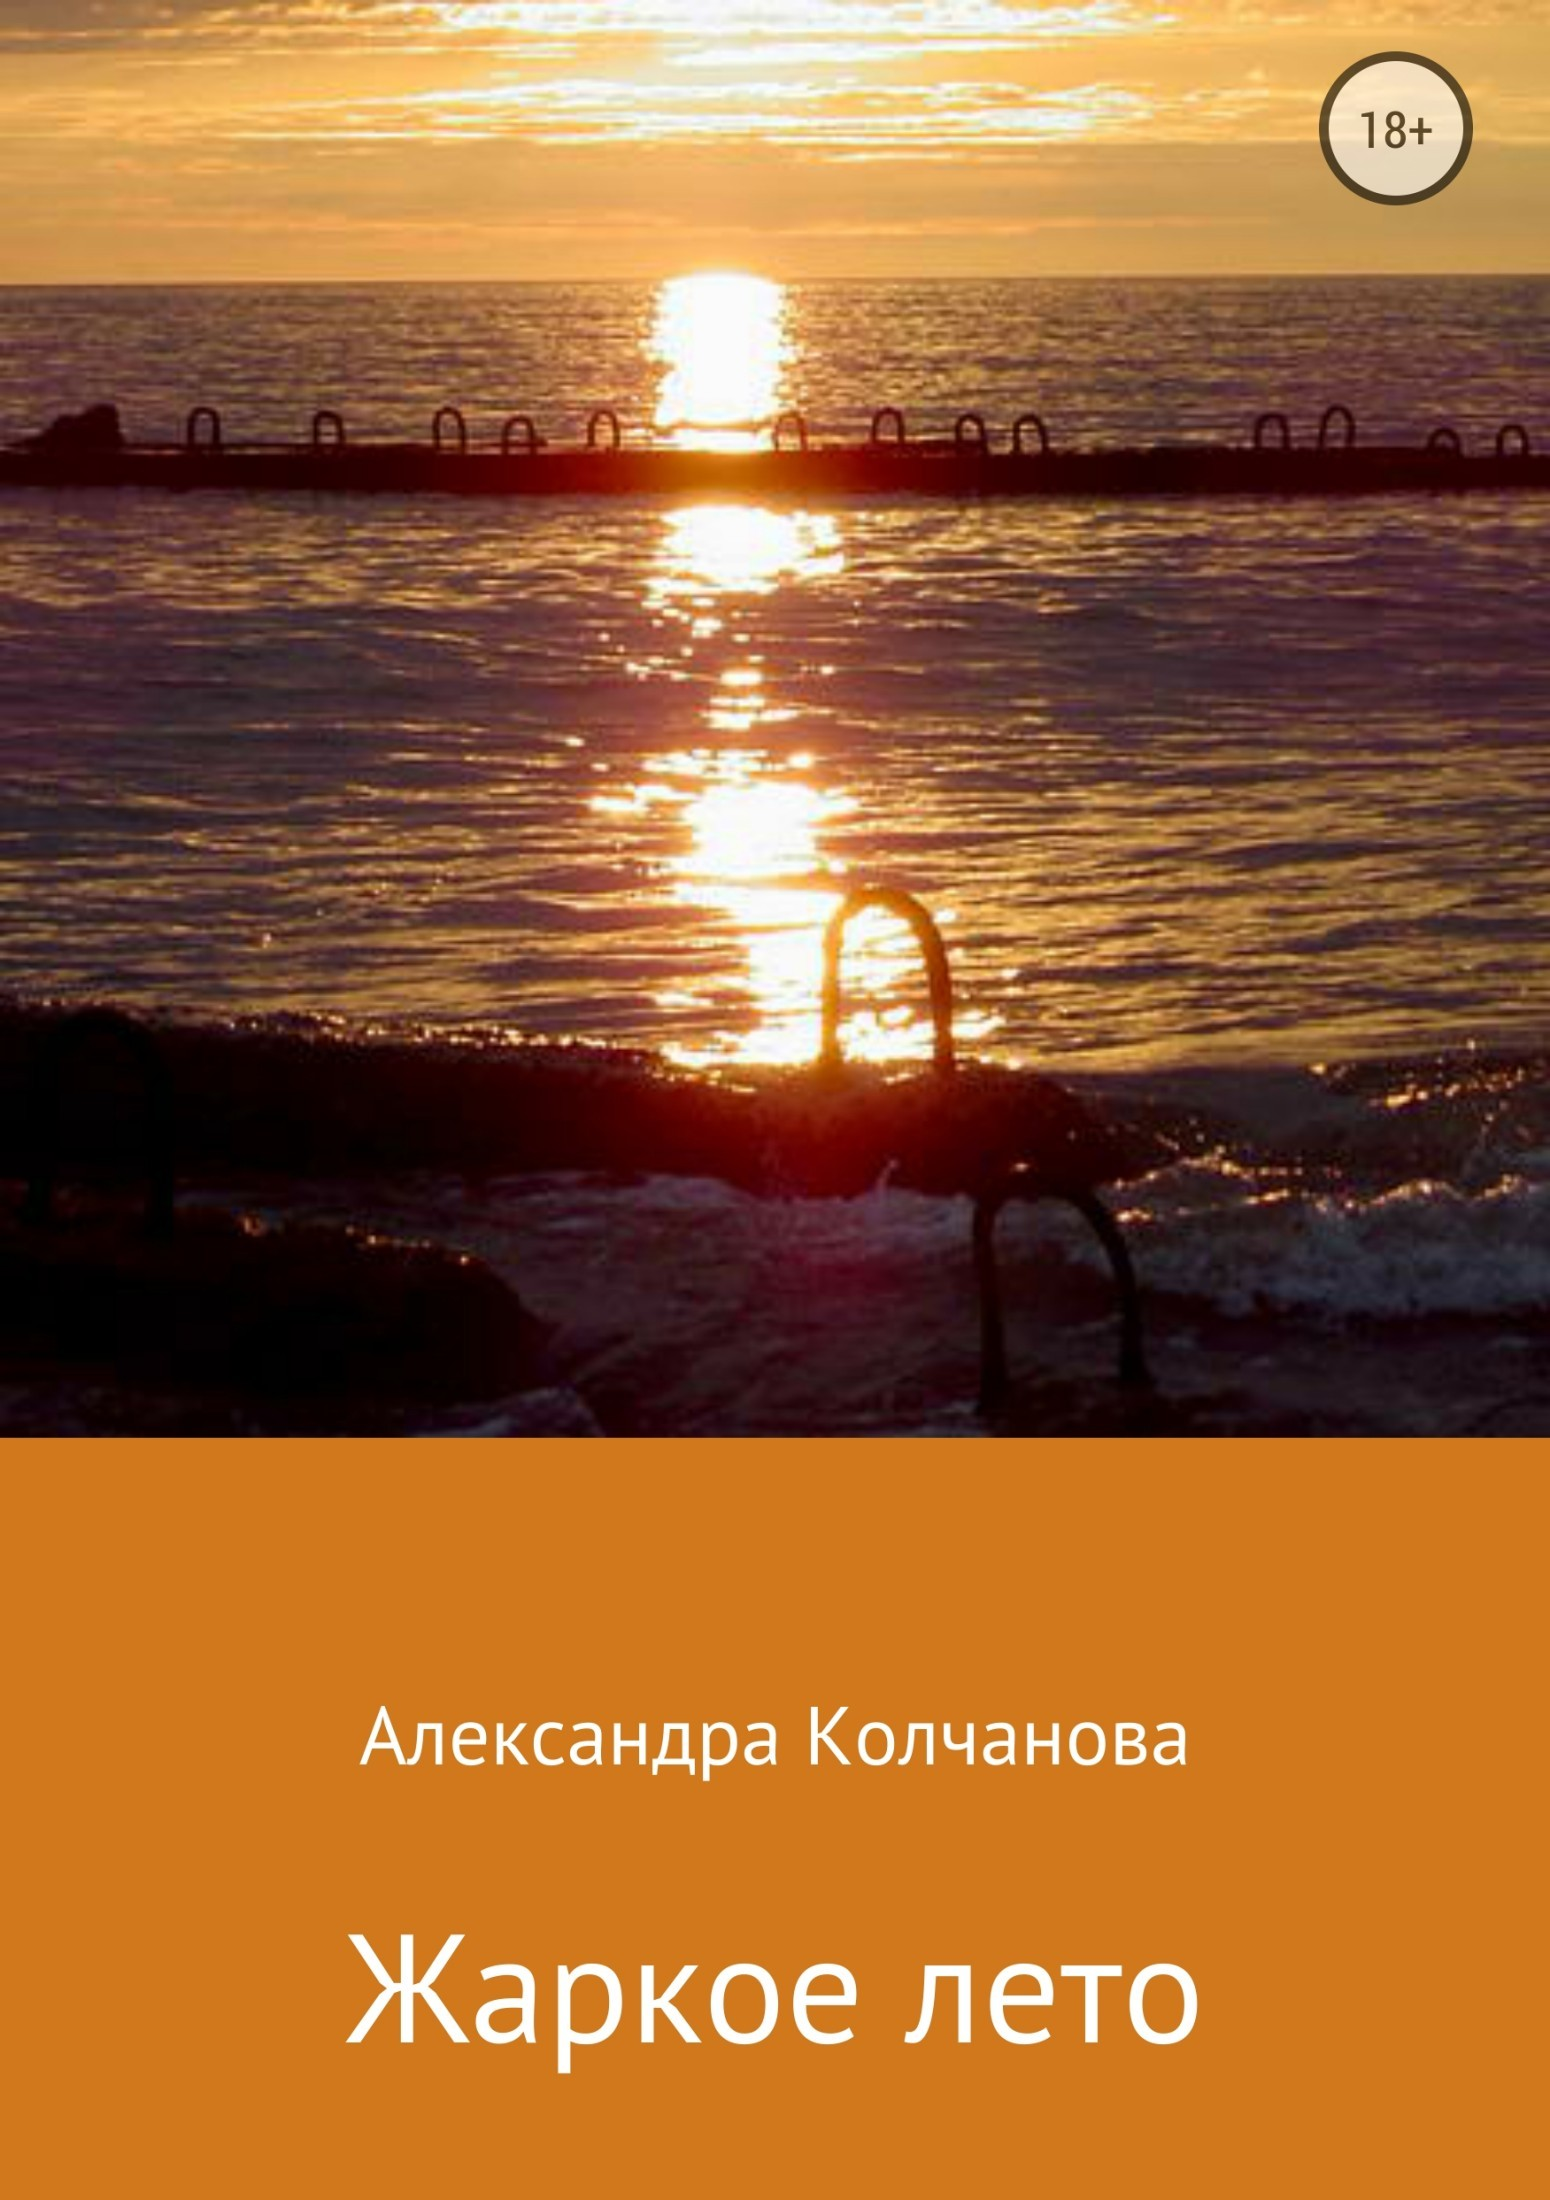 Александра Колчанова Жаркое лето